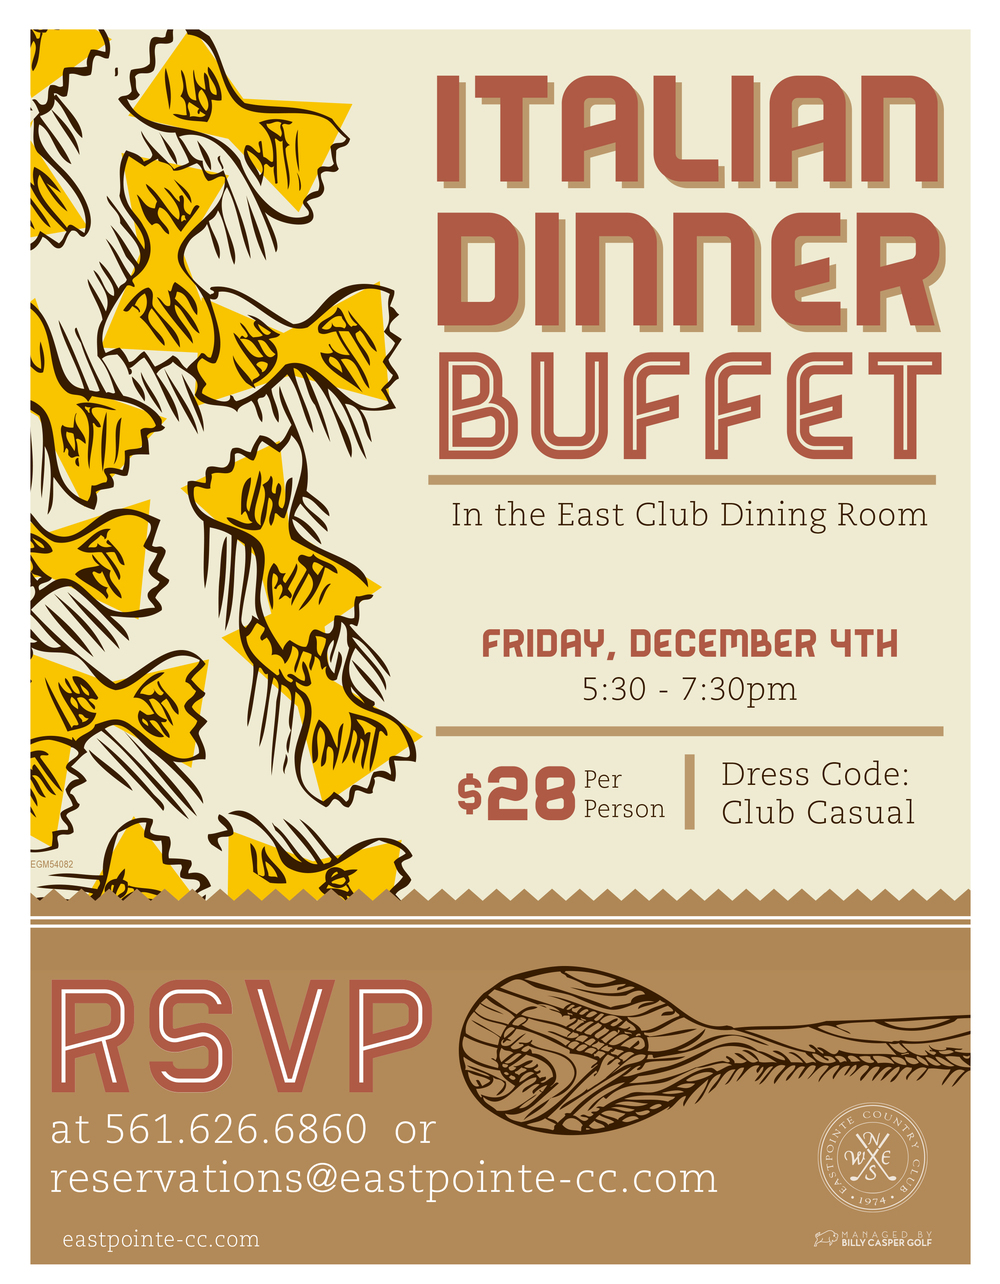 DP_EGM54082 Italian Dinner Buffet Flyer.jpg